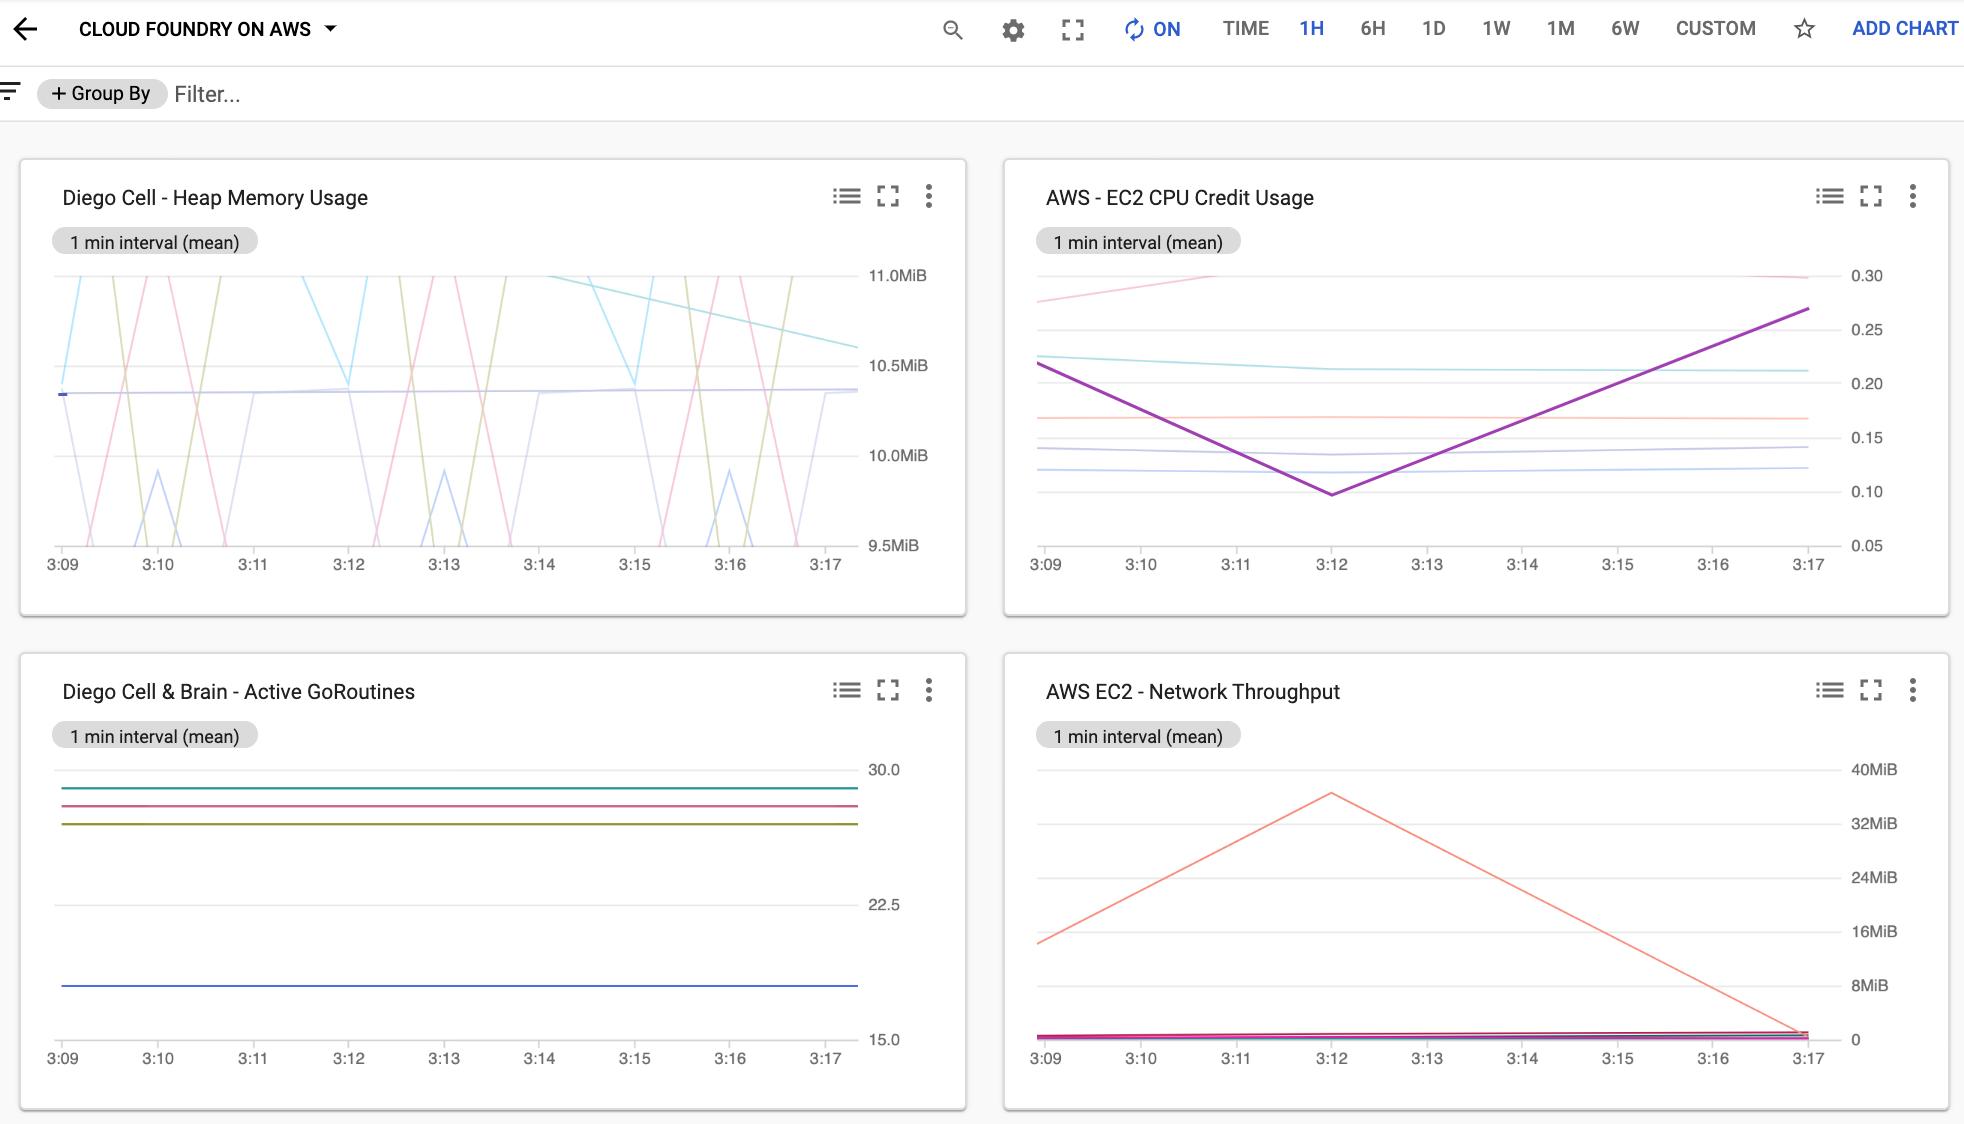 Painel de métricas de desempenho do Cloud Foundry Diego Cell.